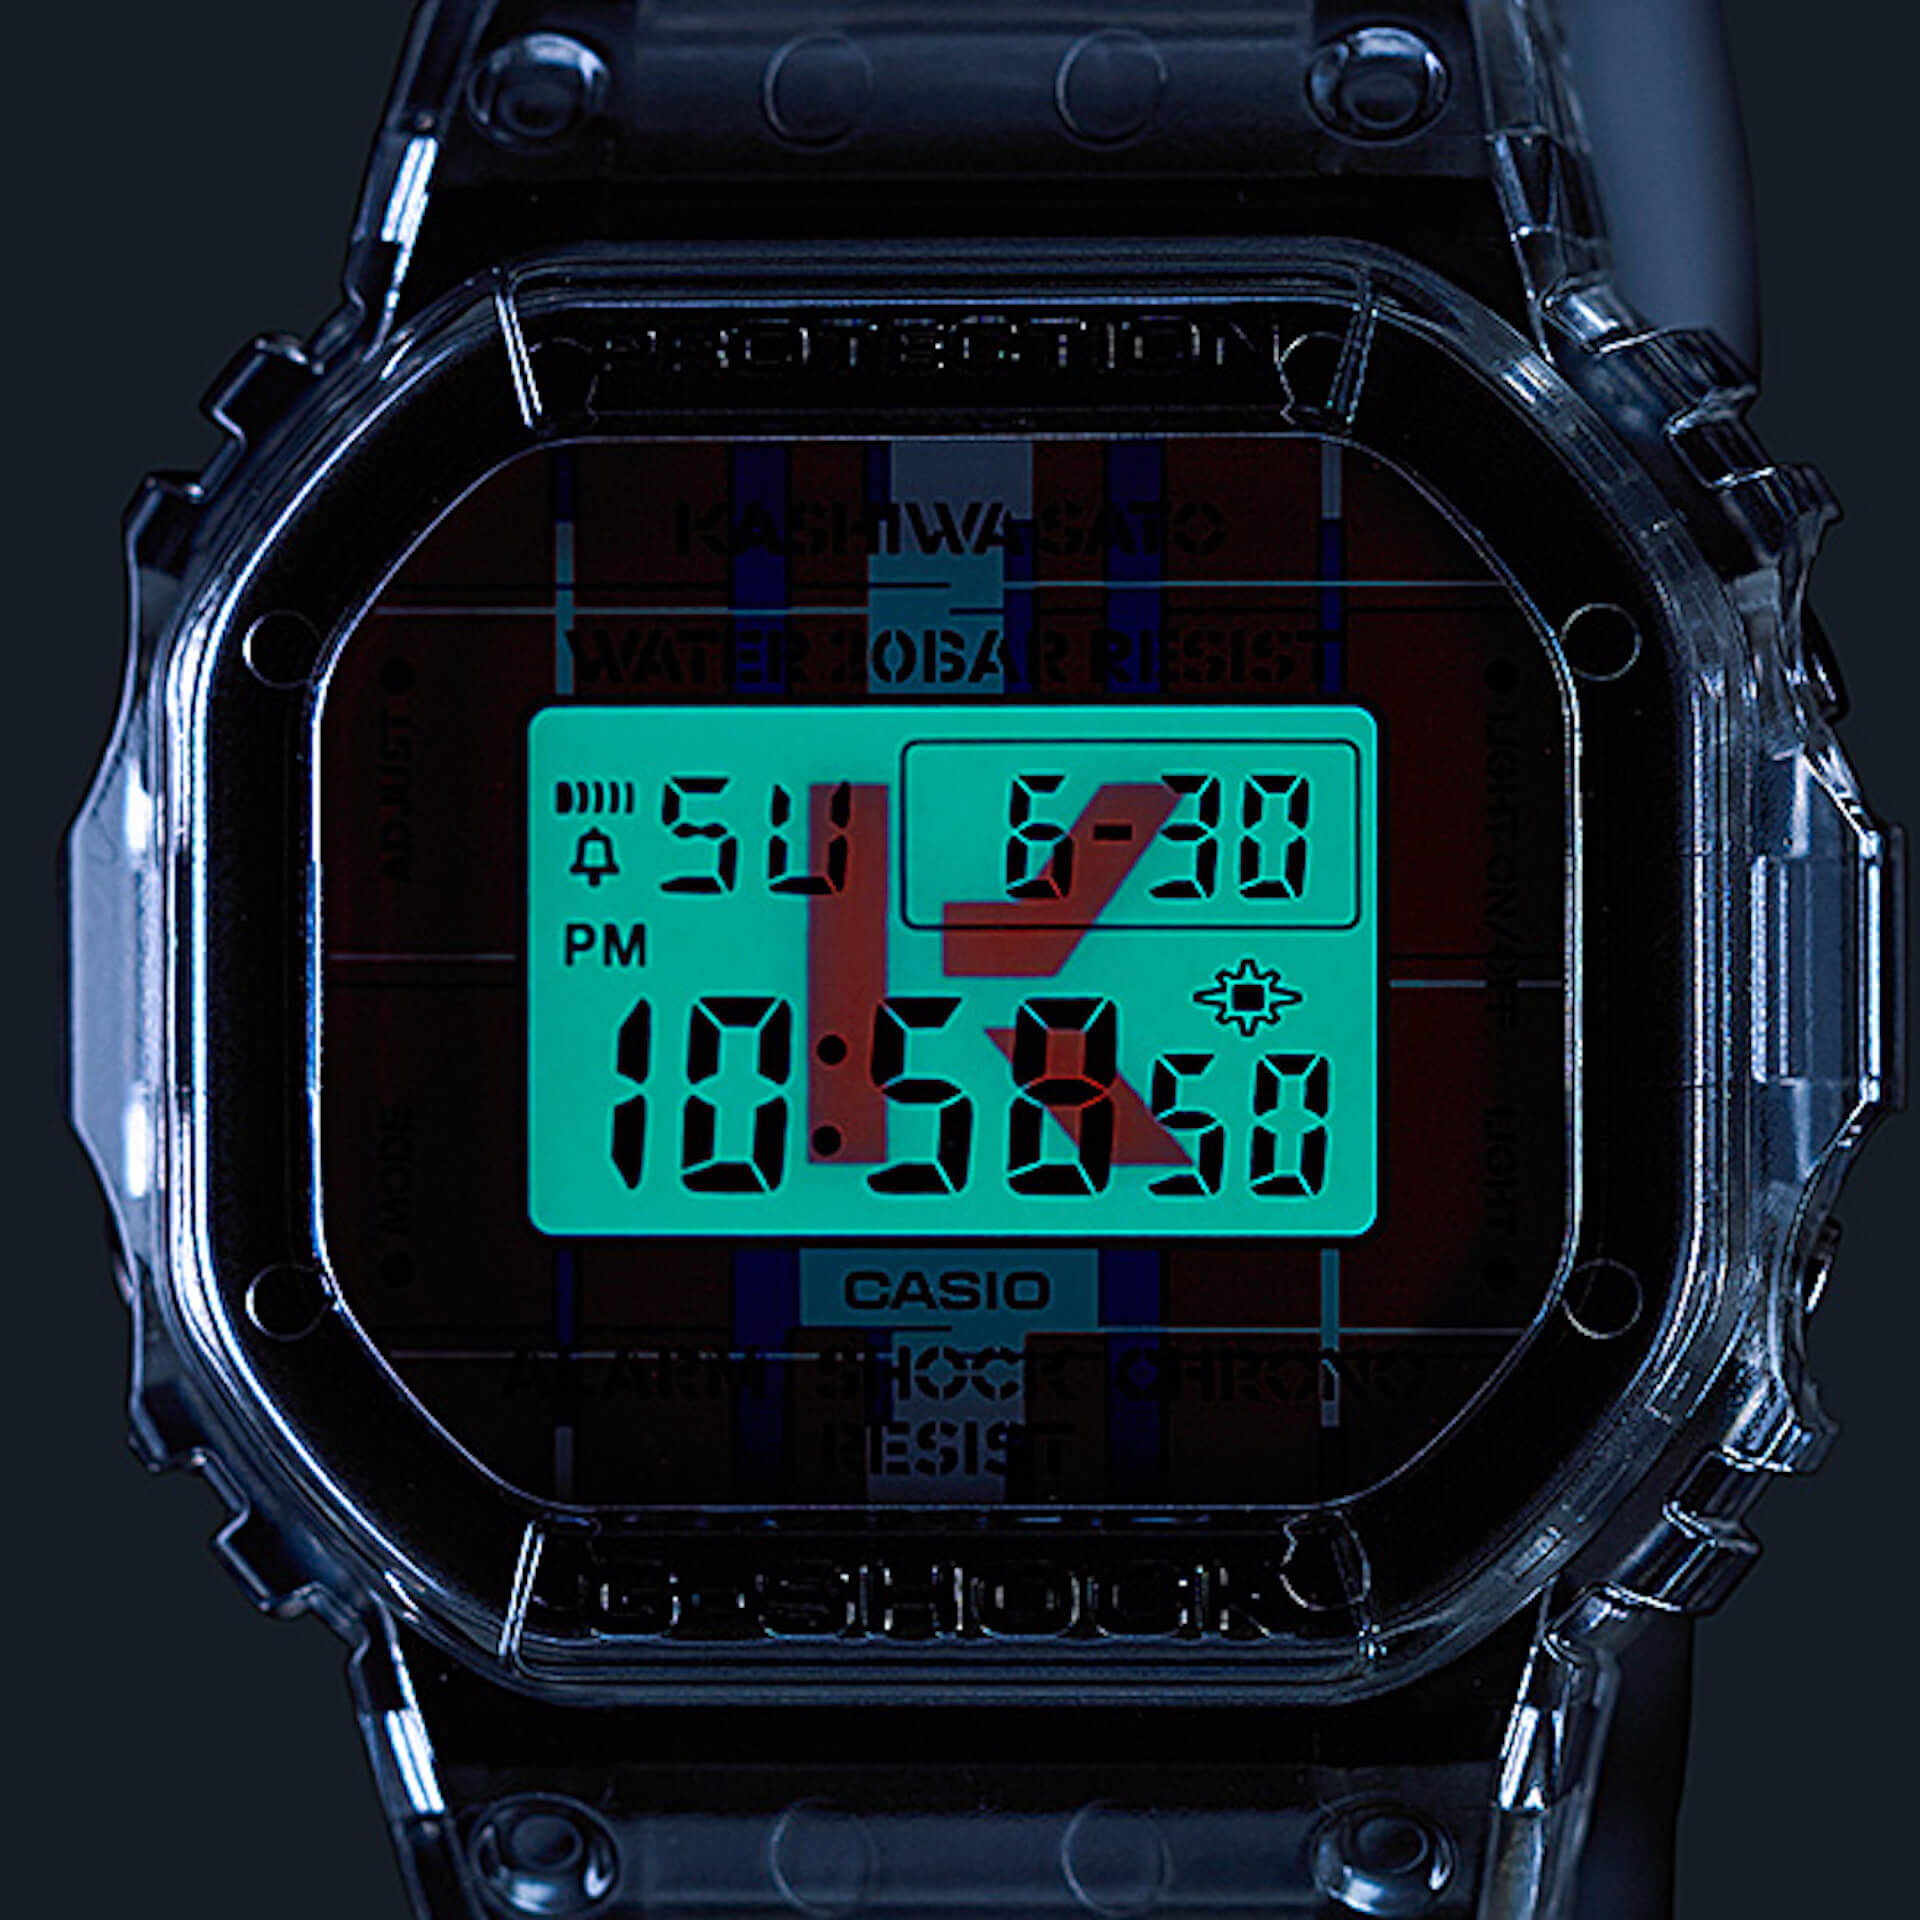 G-SHOCKとクリエイティブディレクター佐藤可士和がコラボ!「LINES」をモチーフとした『DWE-5600KS』が発売決定 tech210107_g_shock_satokashiwa_5